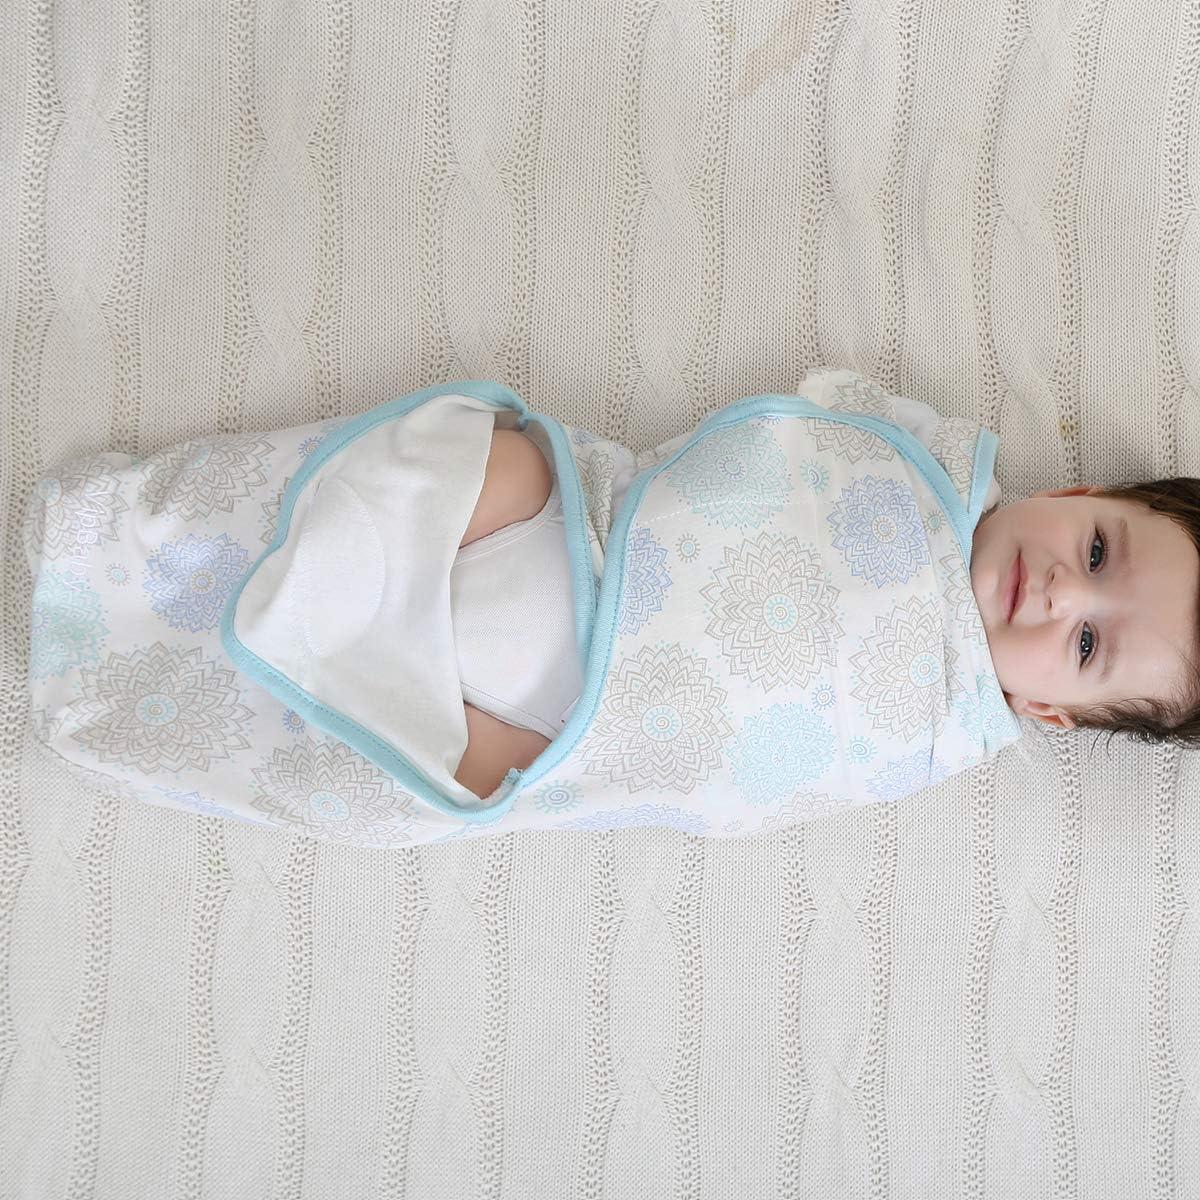 Borlai Baby Swaddle Wrap Reci/én Nacido Manta 100/% Algod/ón Org/ánico Swaddles 2-6 Meses